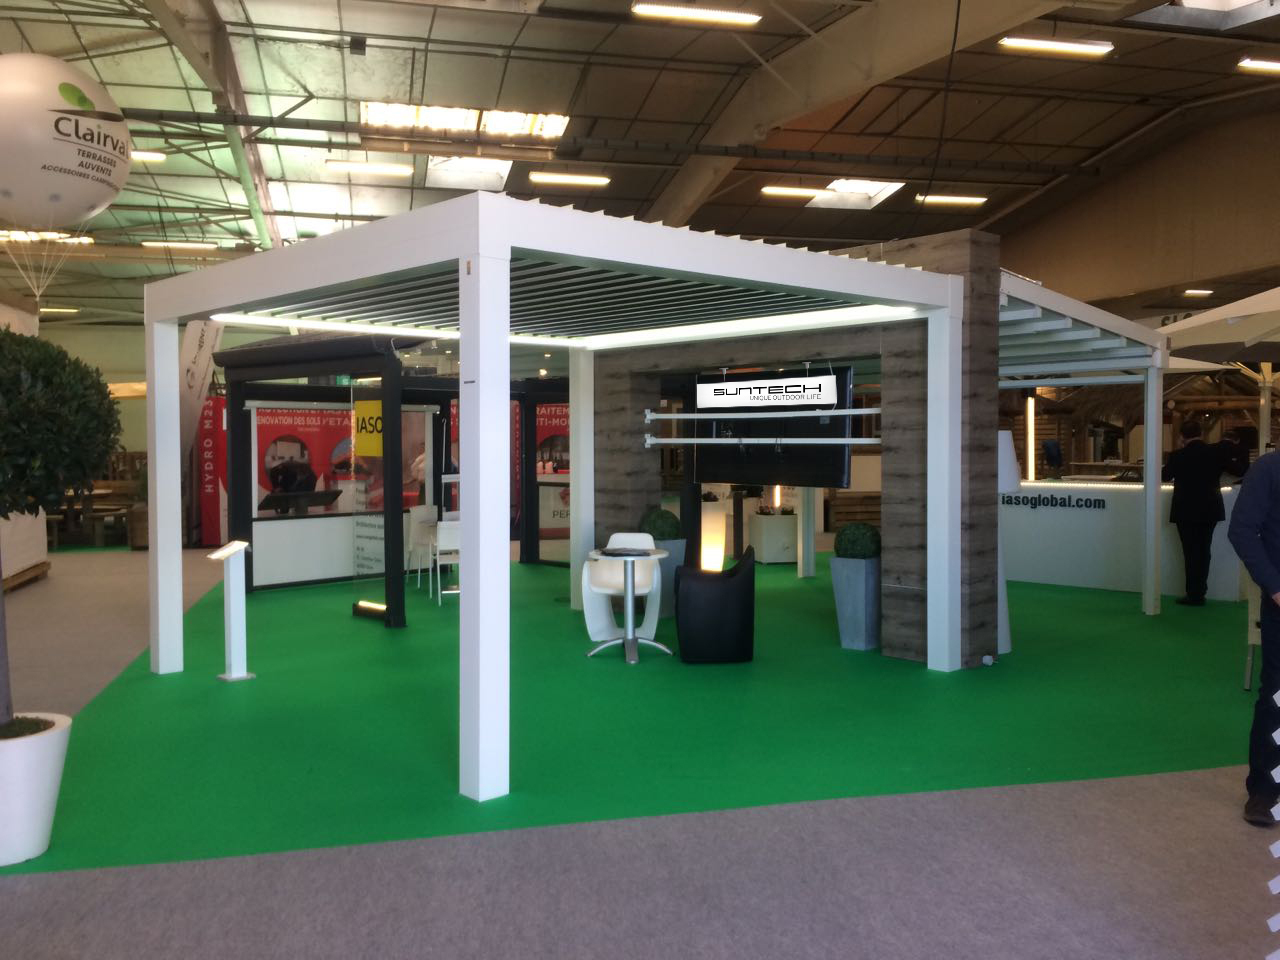 Salon Sett France Show | Albayrak En encequiconcerne Salon De Jardin Montpellier